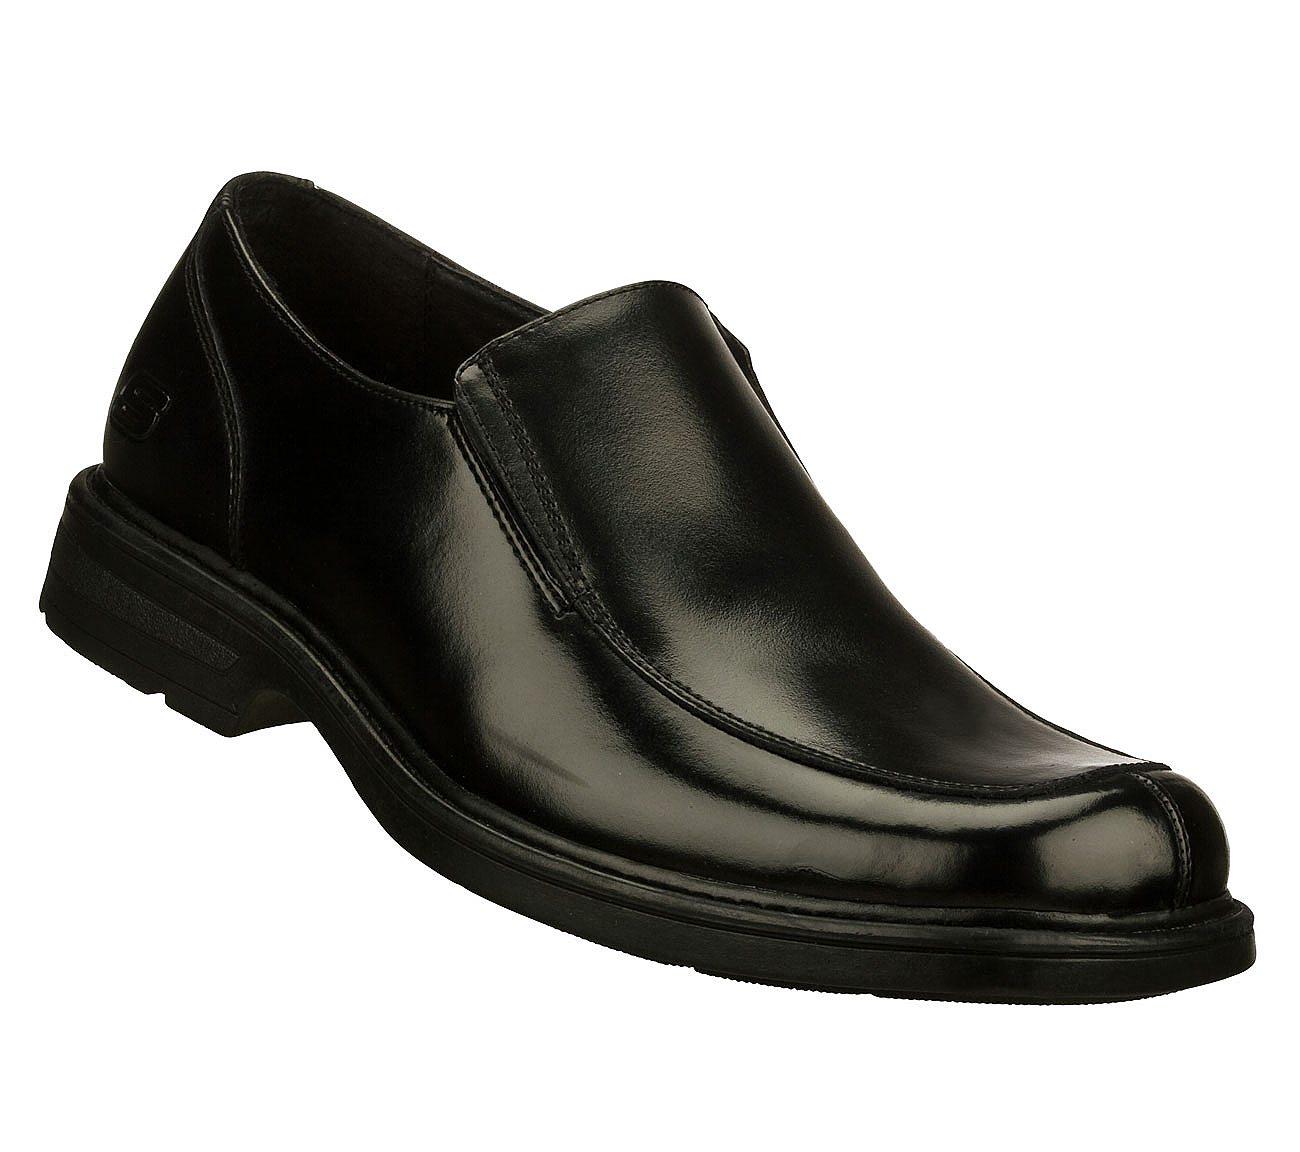 skechers dress shoes \u003e Factory Store